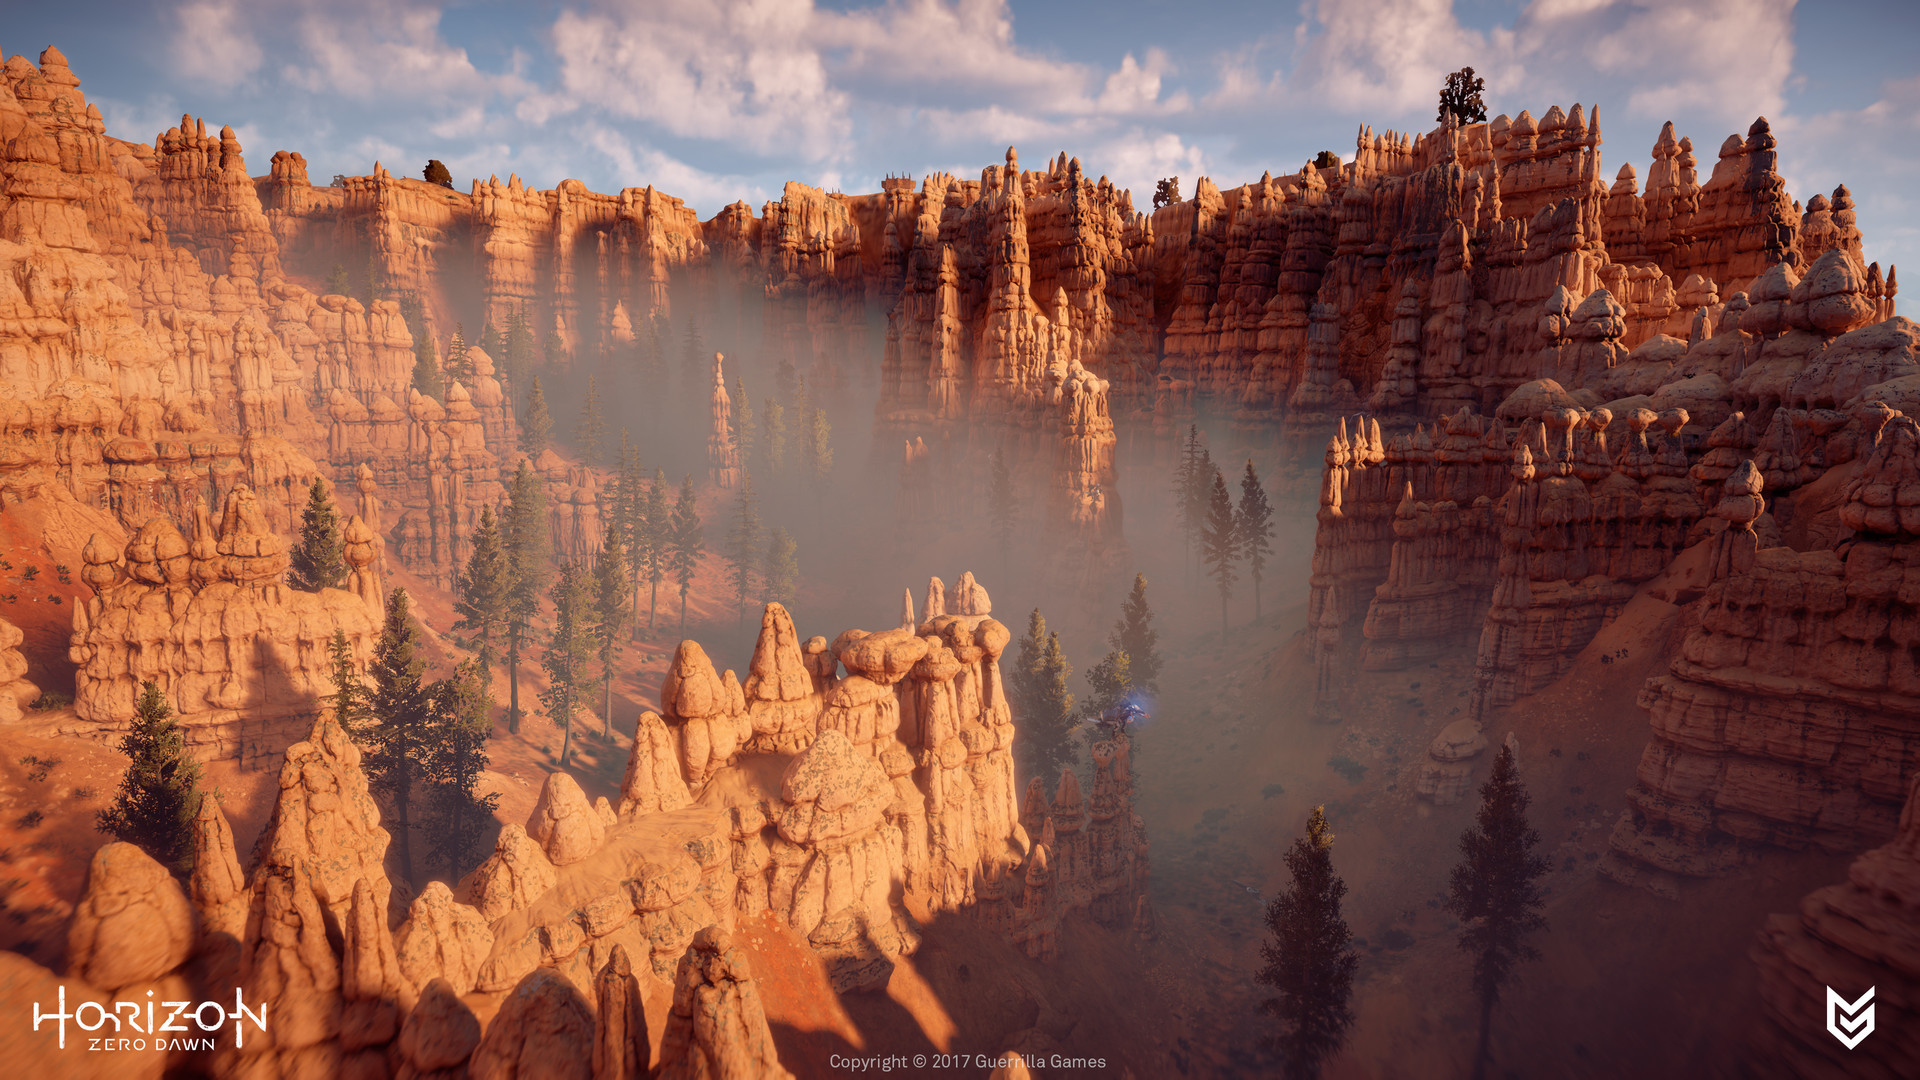 Lukas kolz shadow carja territory based on bryce canyon utah 02